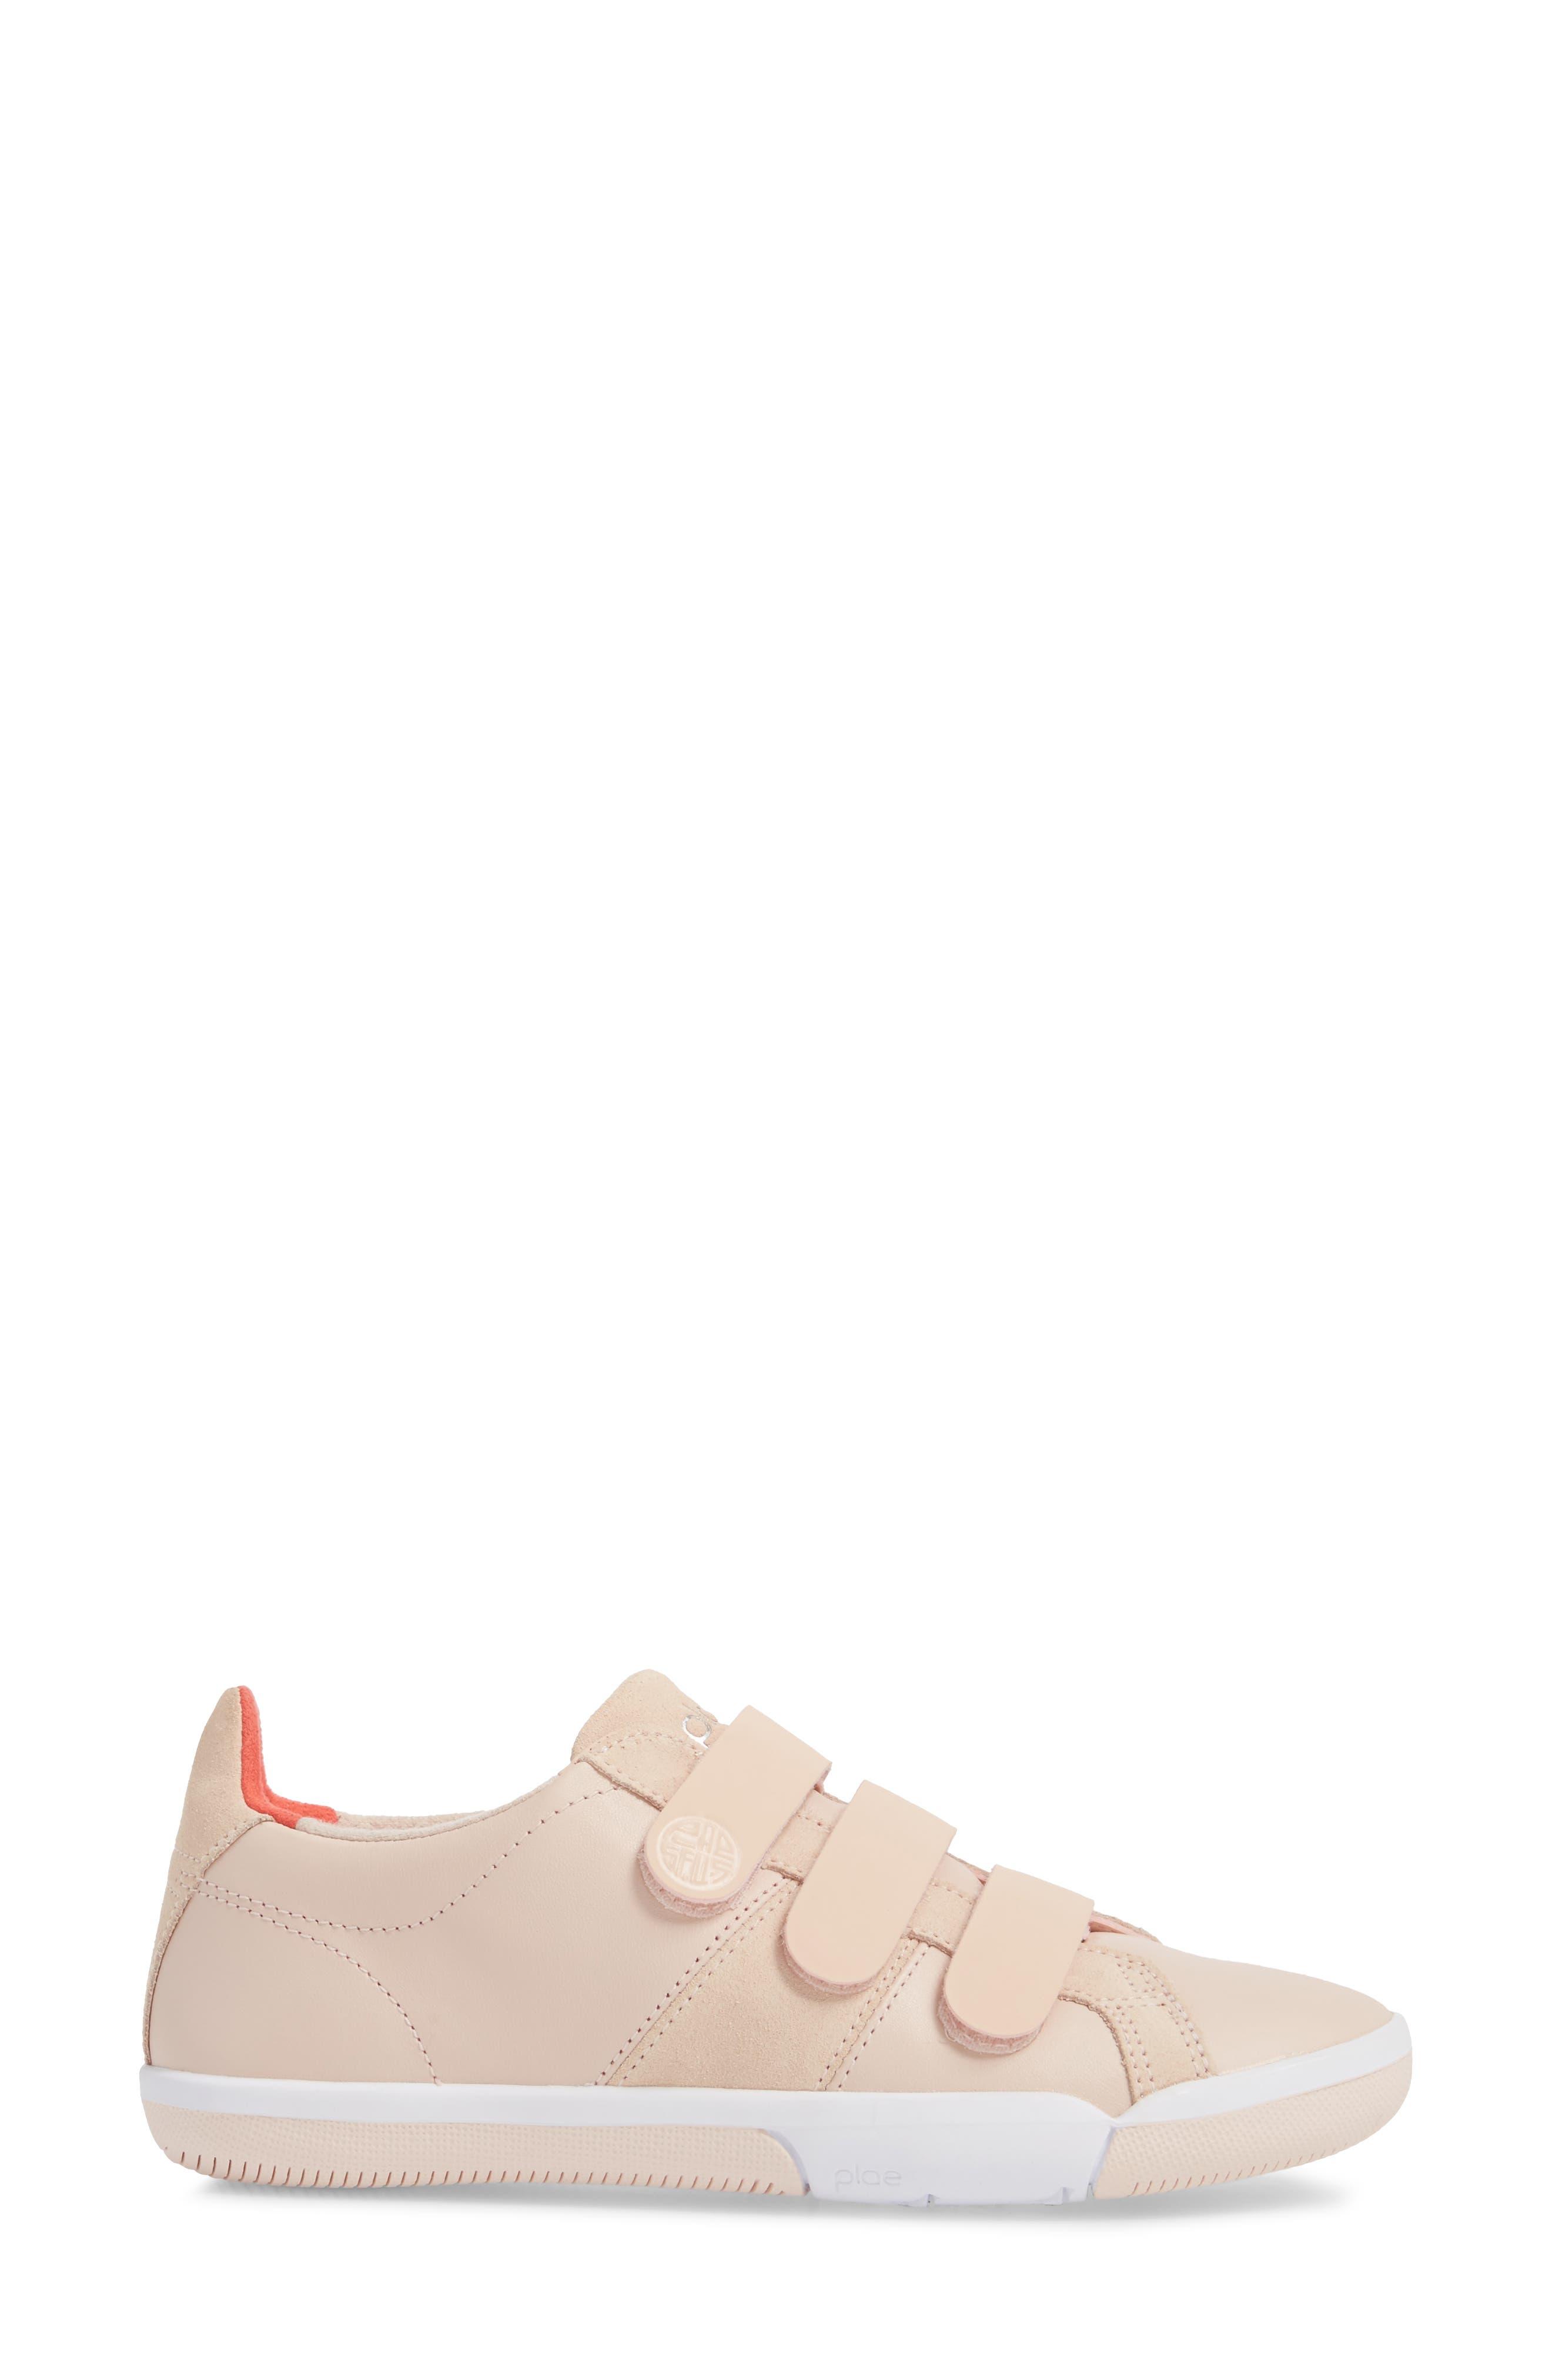 Larkin Sneaker,                             Alternate thumbnail 3, color,                             Cameo Rose Leather